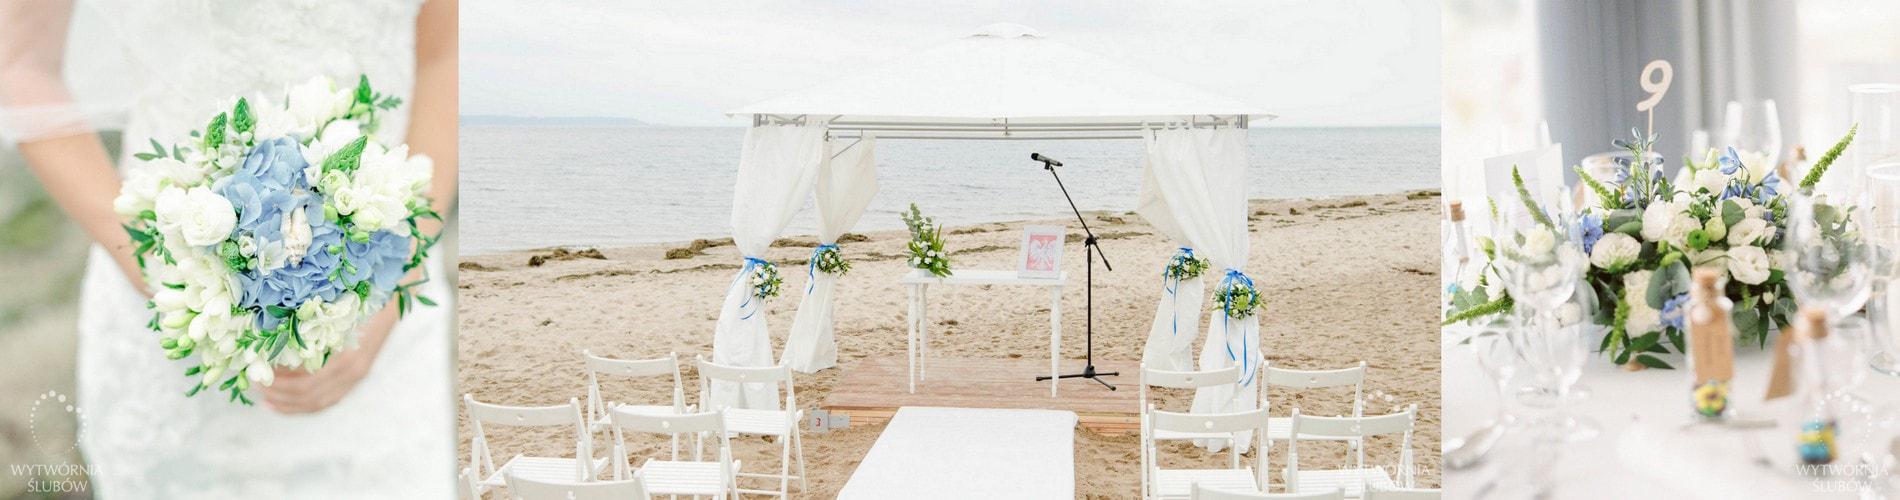 konsultant ślubny gdynia